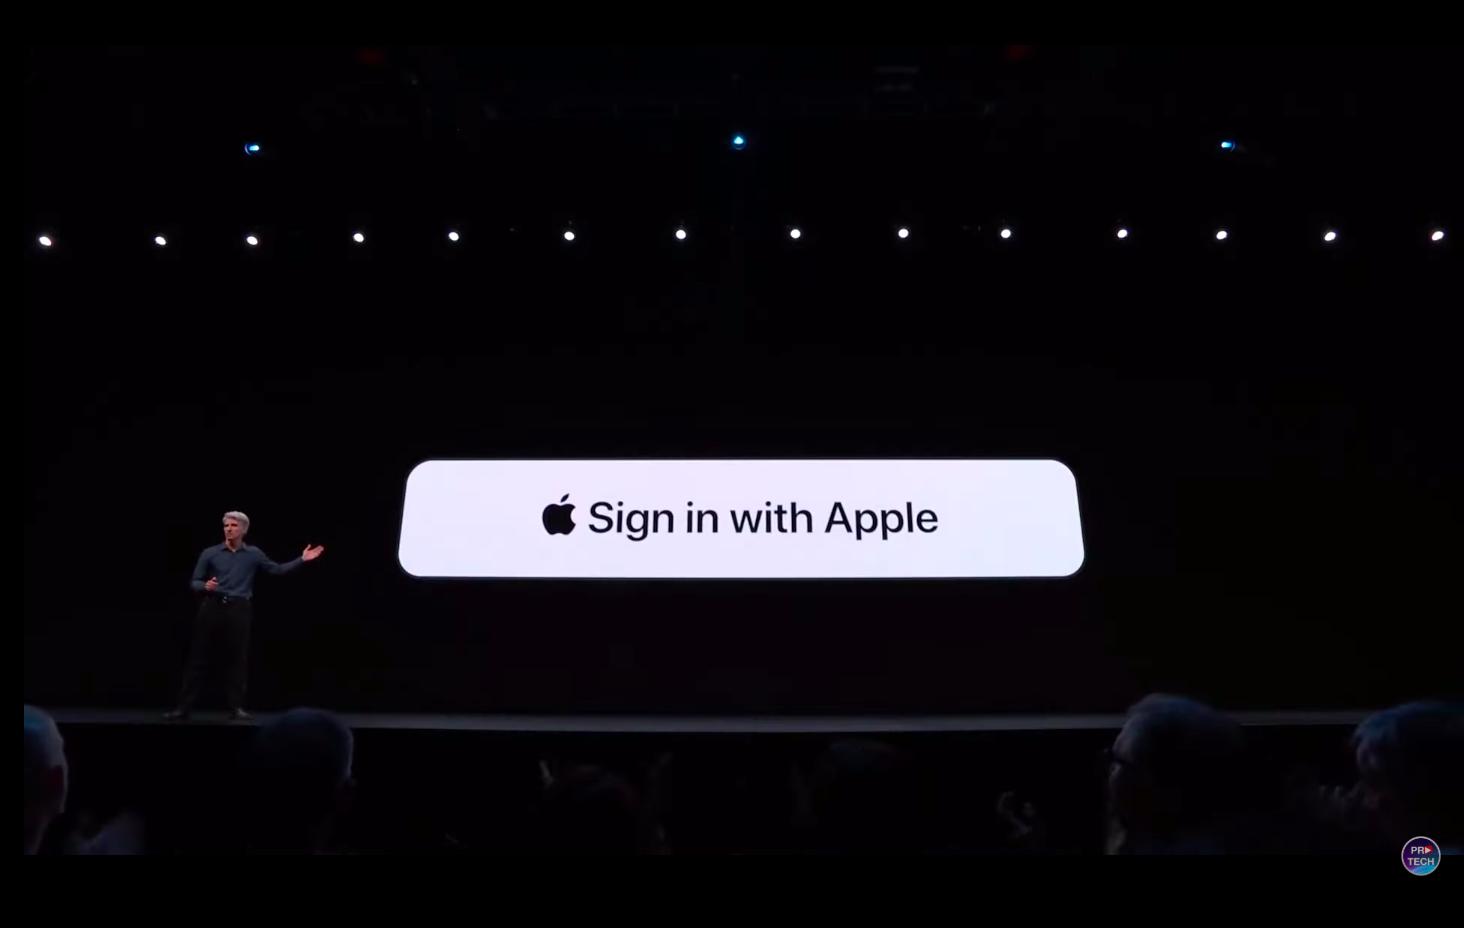 signinwithapple